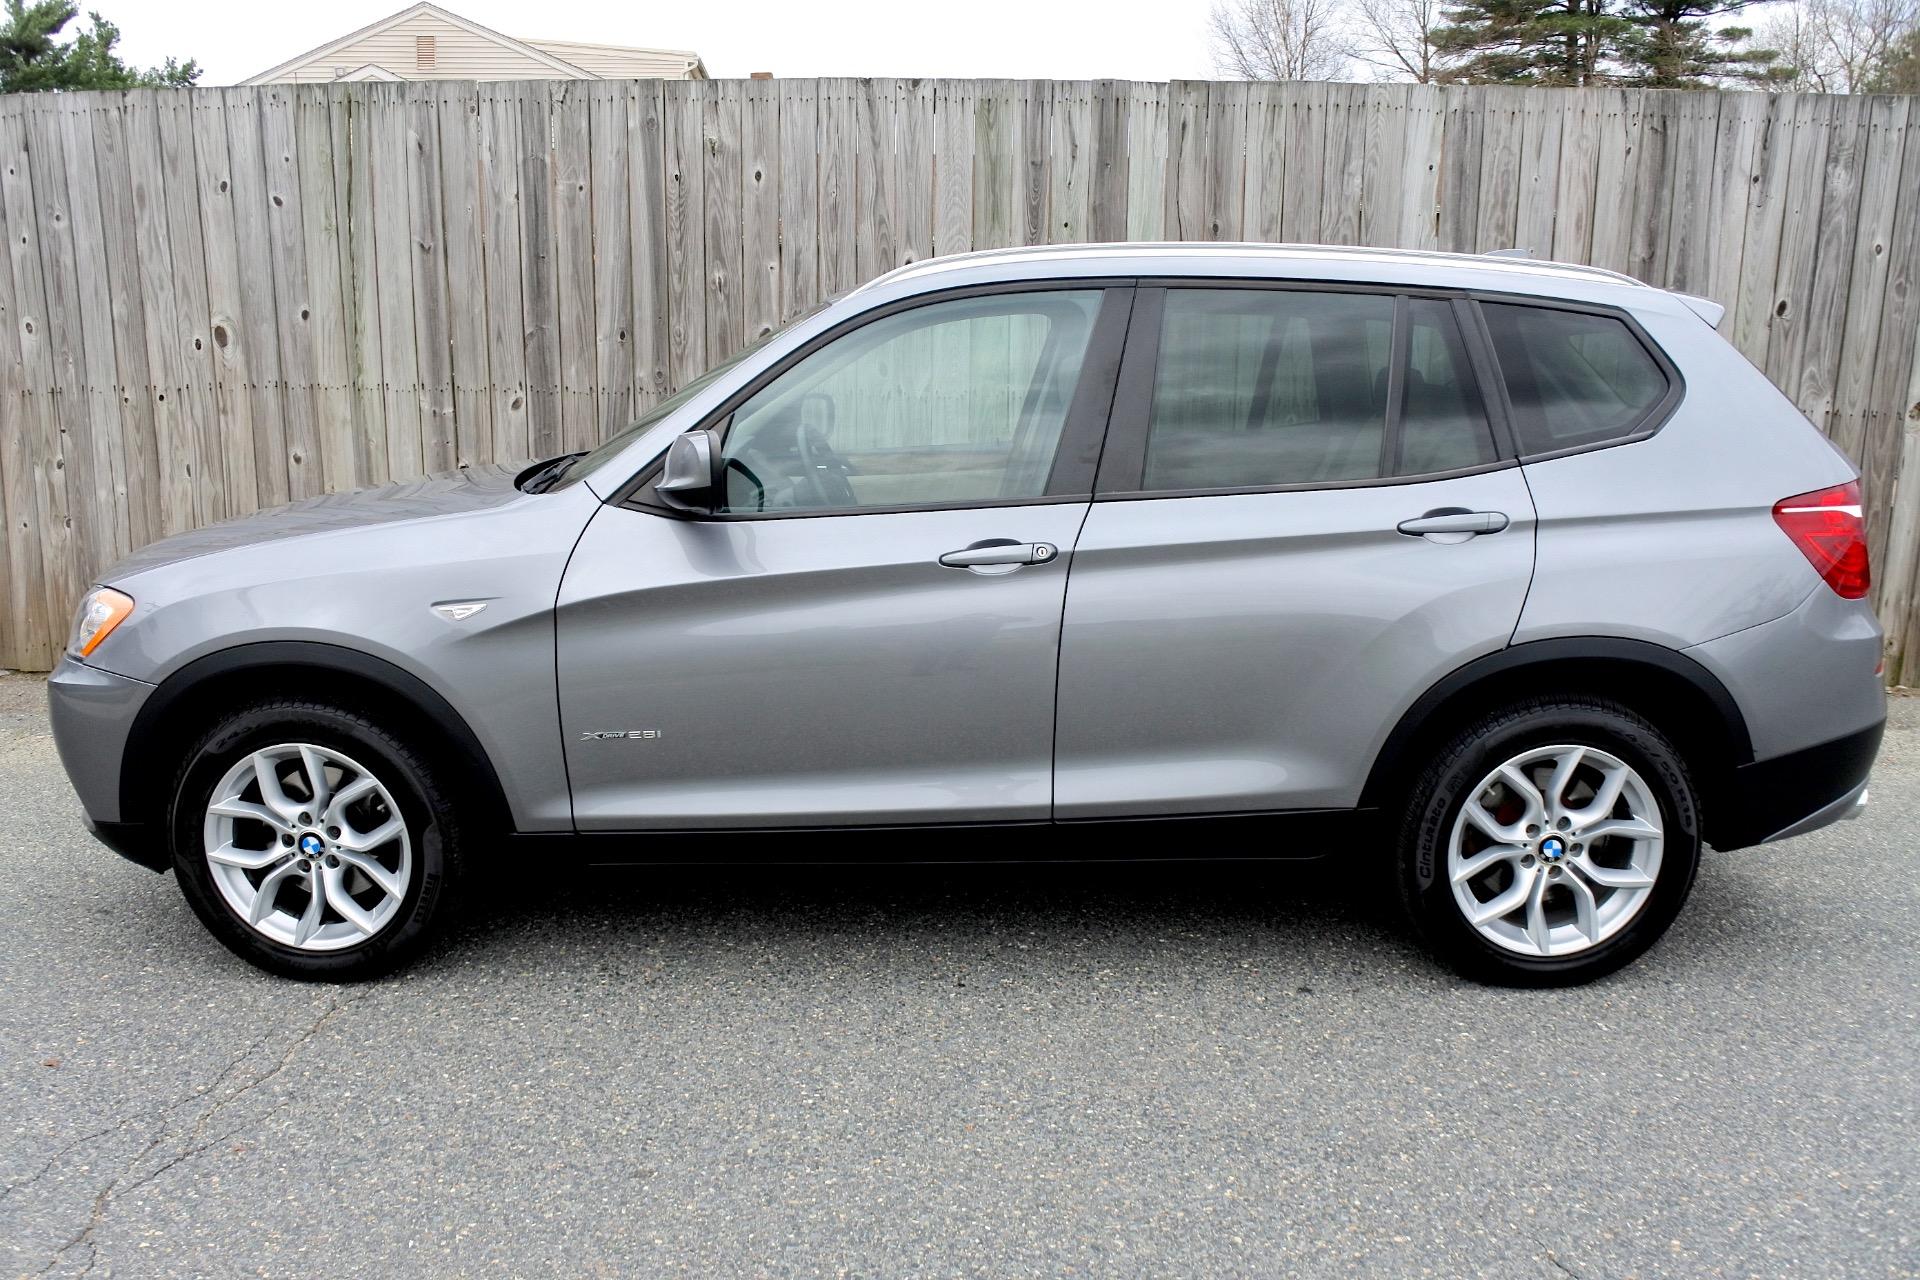 Used 2013 BMW X3 xDrive28i AWD Used 2013 BMW X3 xDrive28i AWD for sale  at Metro West Motorcars LLC in Shrewsbury MA 2